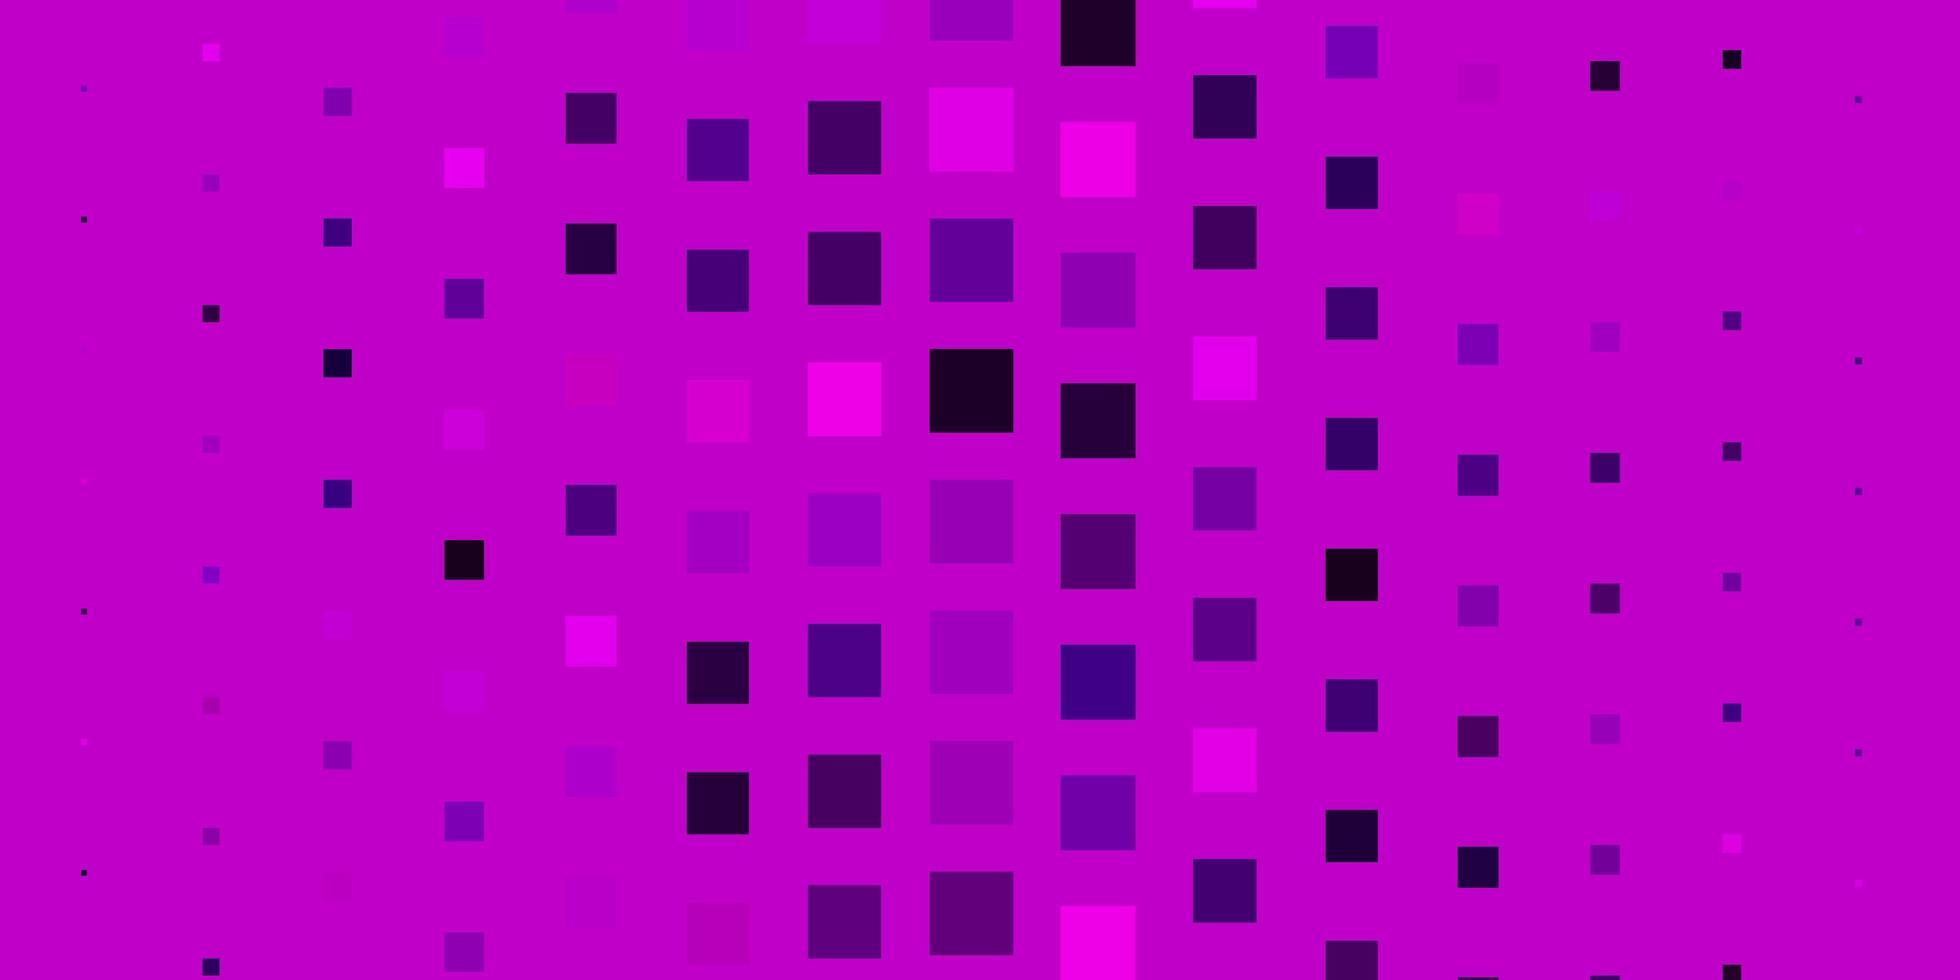 hellrosa Vektormuster im quadratischen Stil. vektor